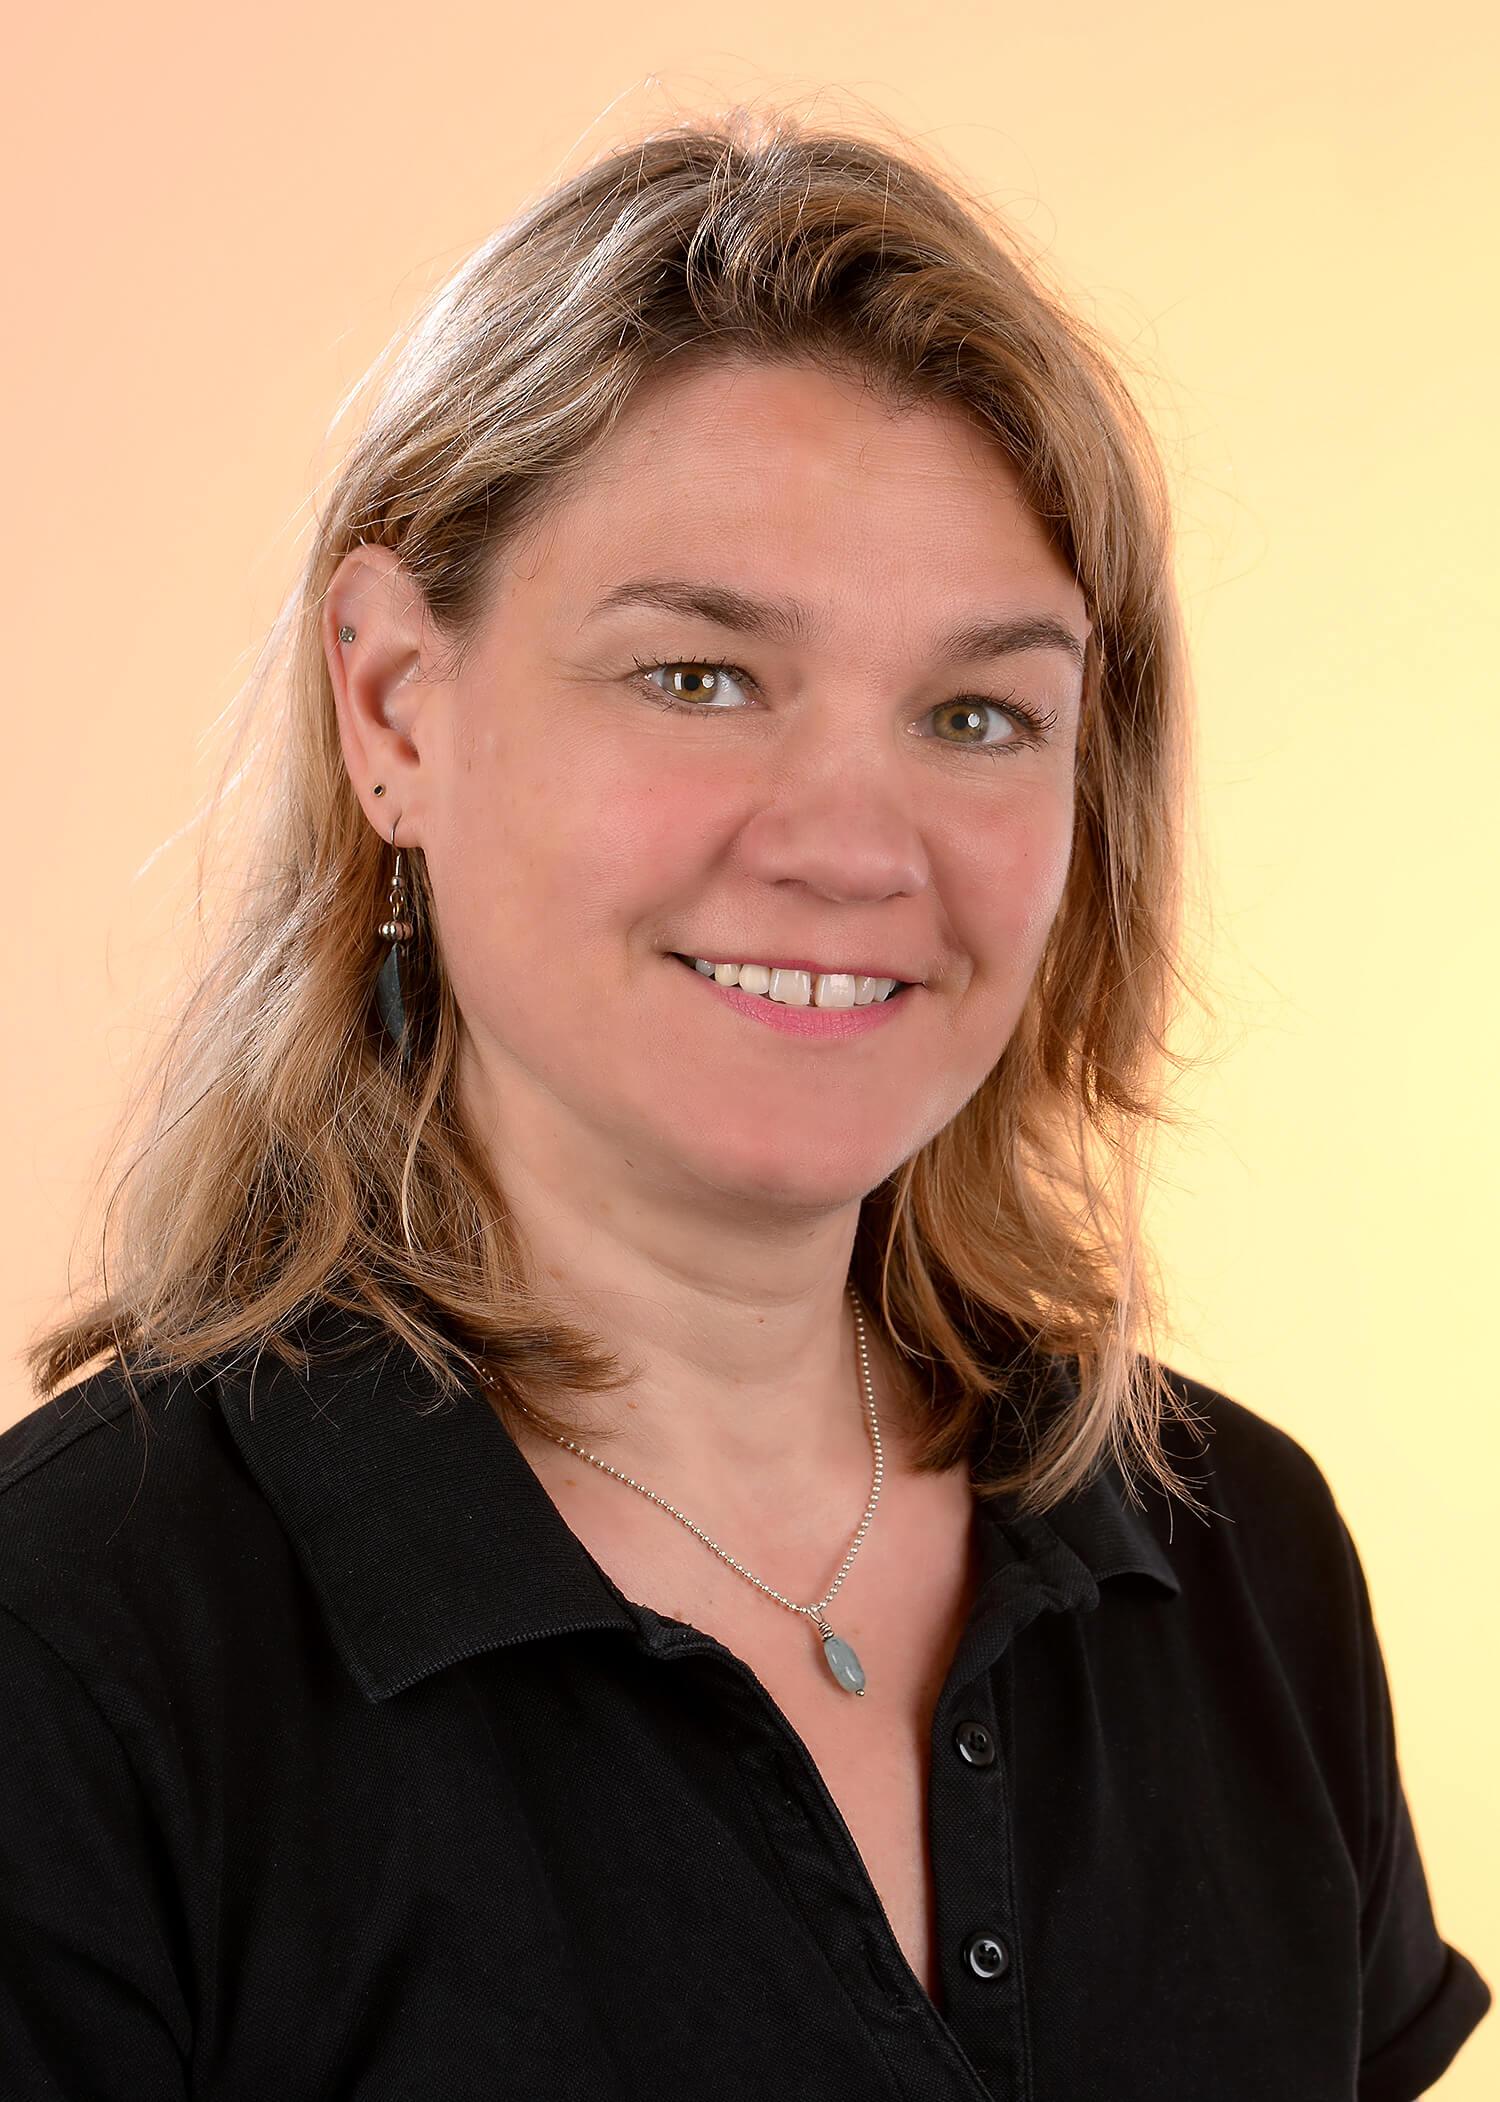 Birgit Aschenbroich, Physiotherapeutin